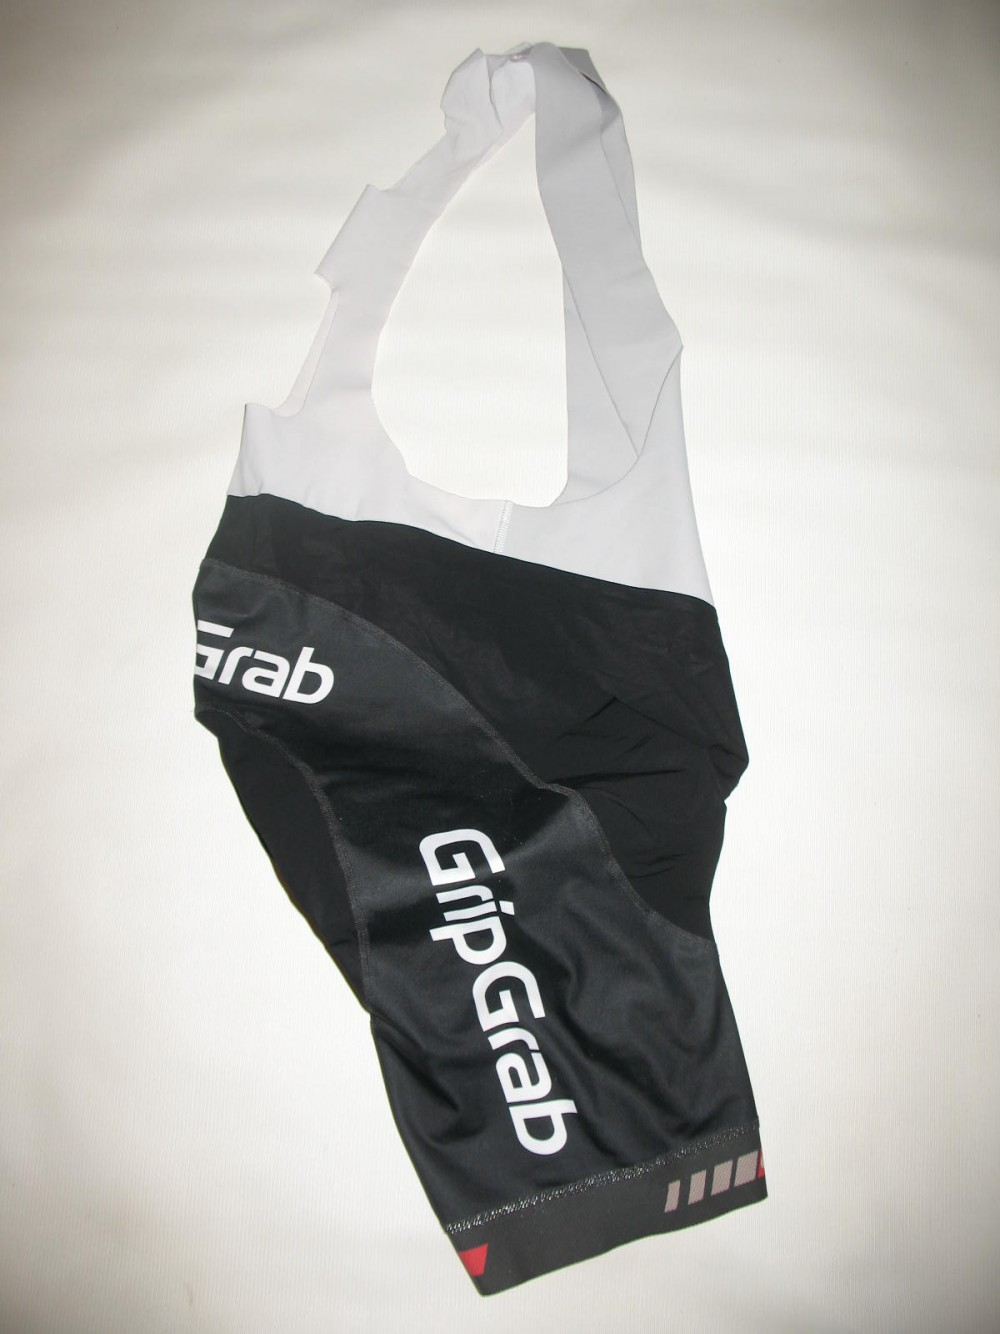 Велошорты GRIPGRAB team cycling bib shorts (размер 5-XL) - 1